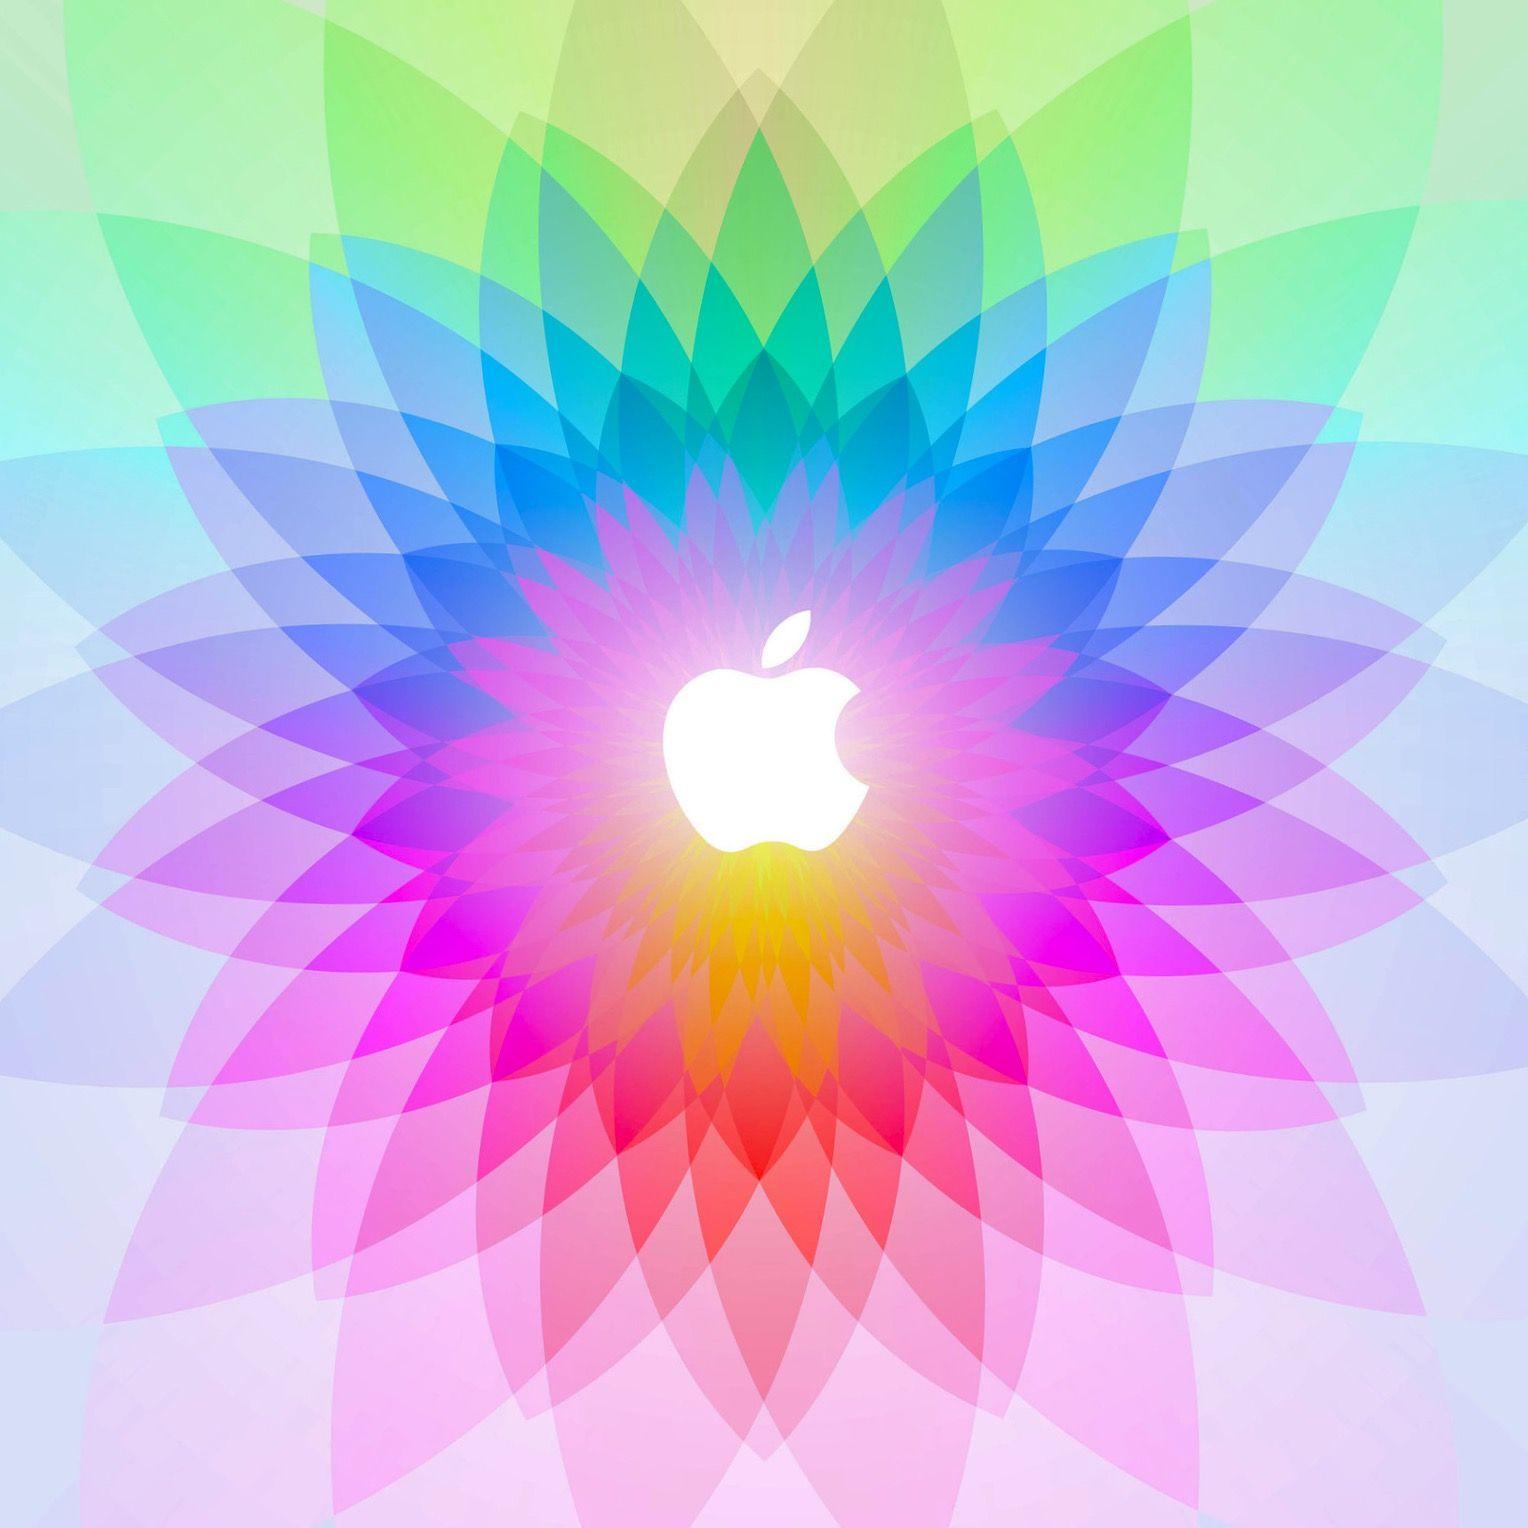 Apple Inc. Ipad pro wallpaper, Ipad wallpaper, Apple